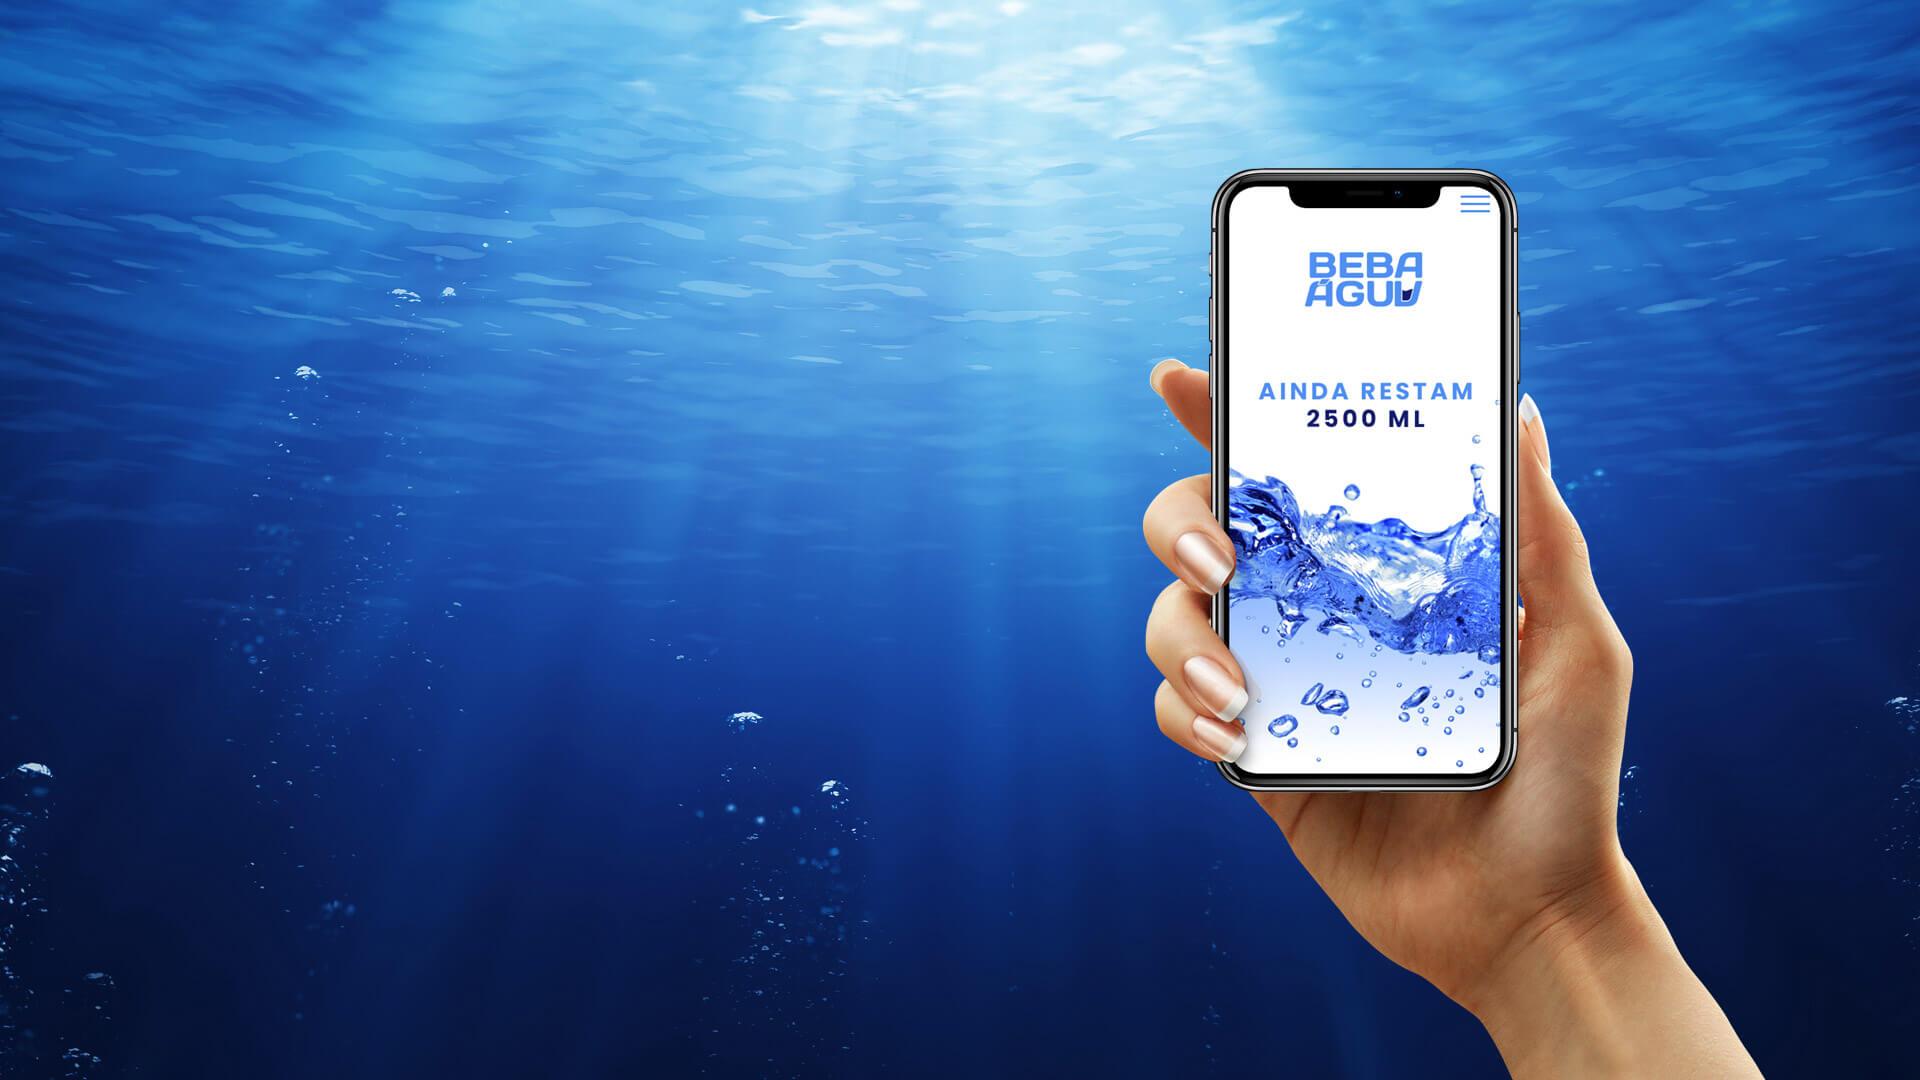 Aplicativo Beba Água